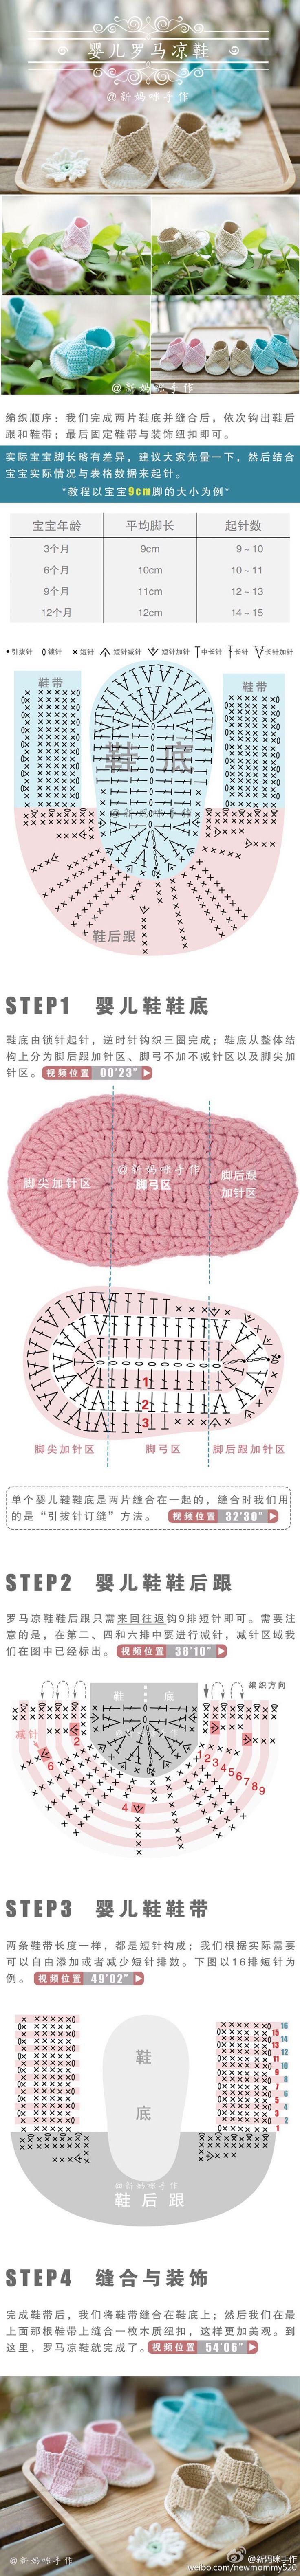 Crochet Baby Slippers - Chart ❥ 4U hilariafina  http://www.pinterest.com/hilariafina/